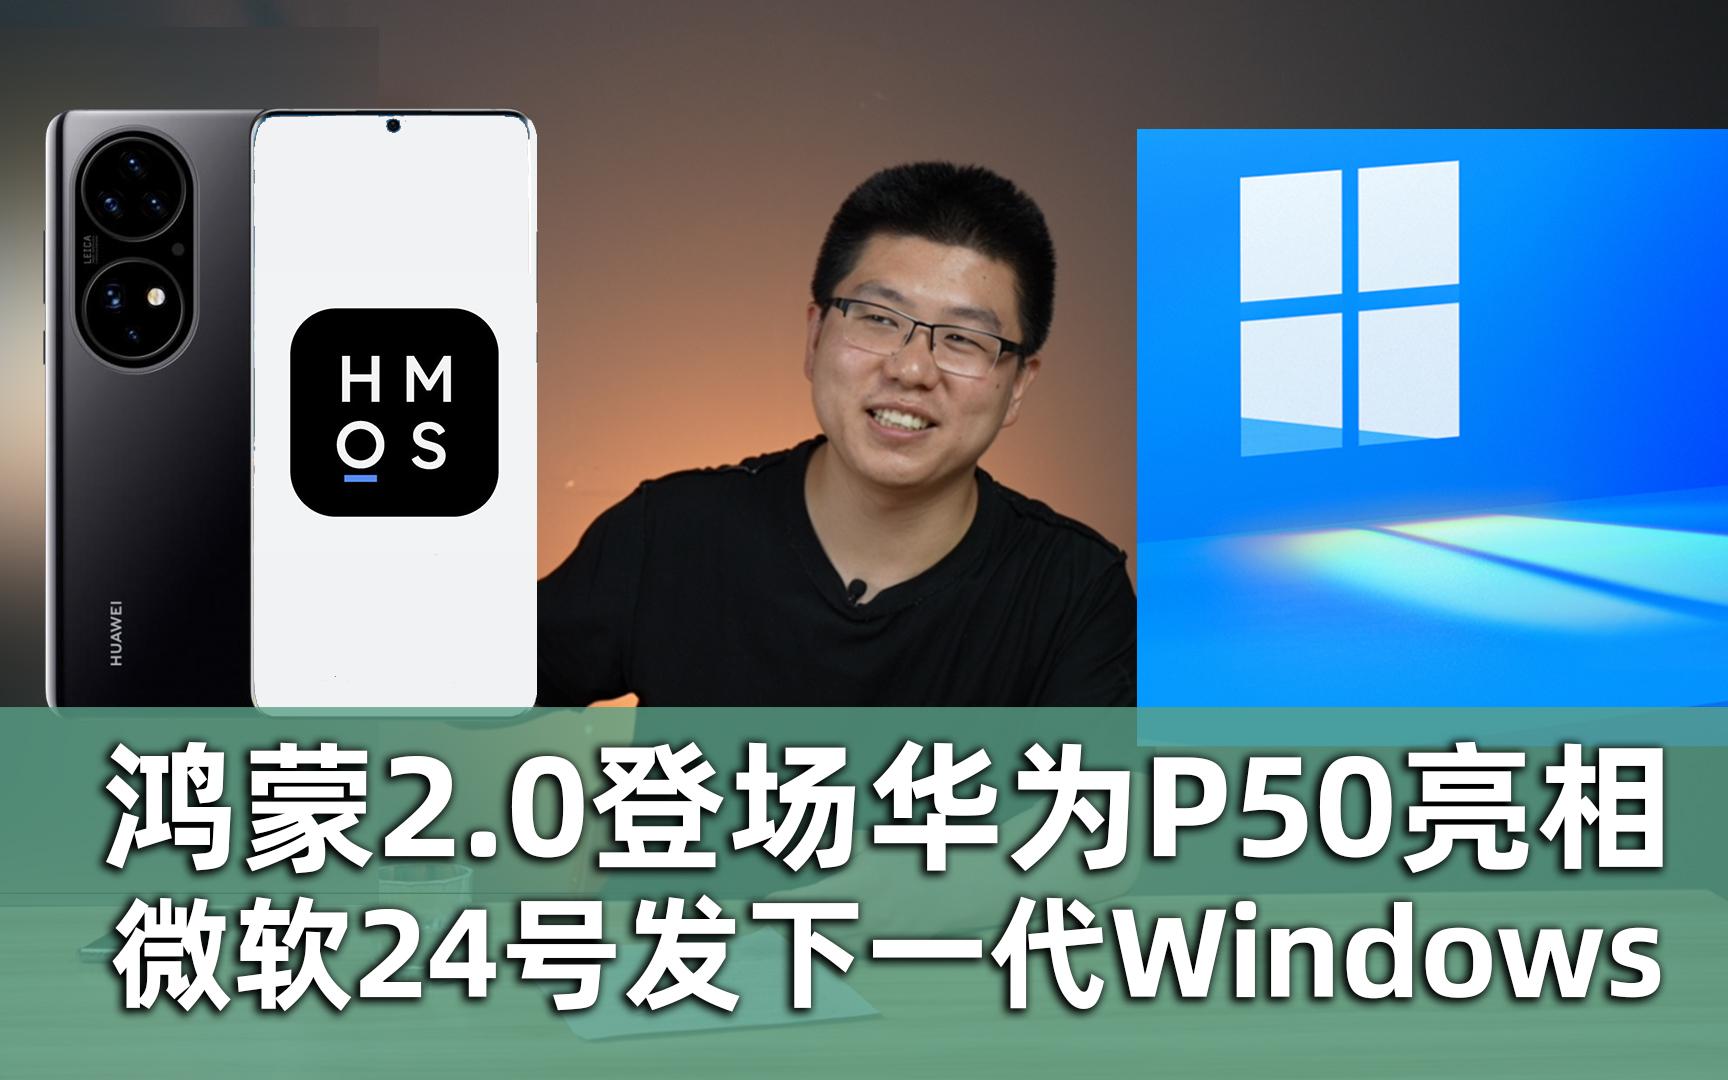 【E周报】63:鸿蒙2.0登场华为P50亮相,微软24号发下一代Windows